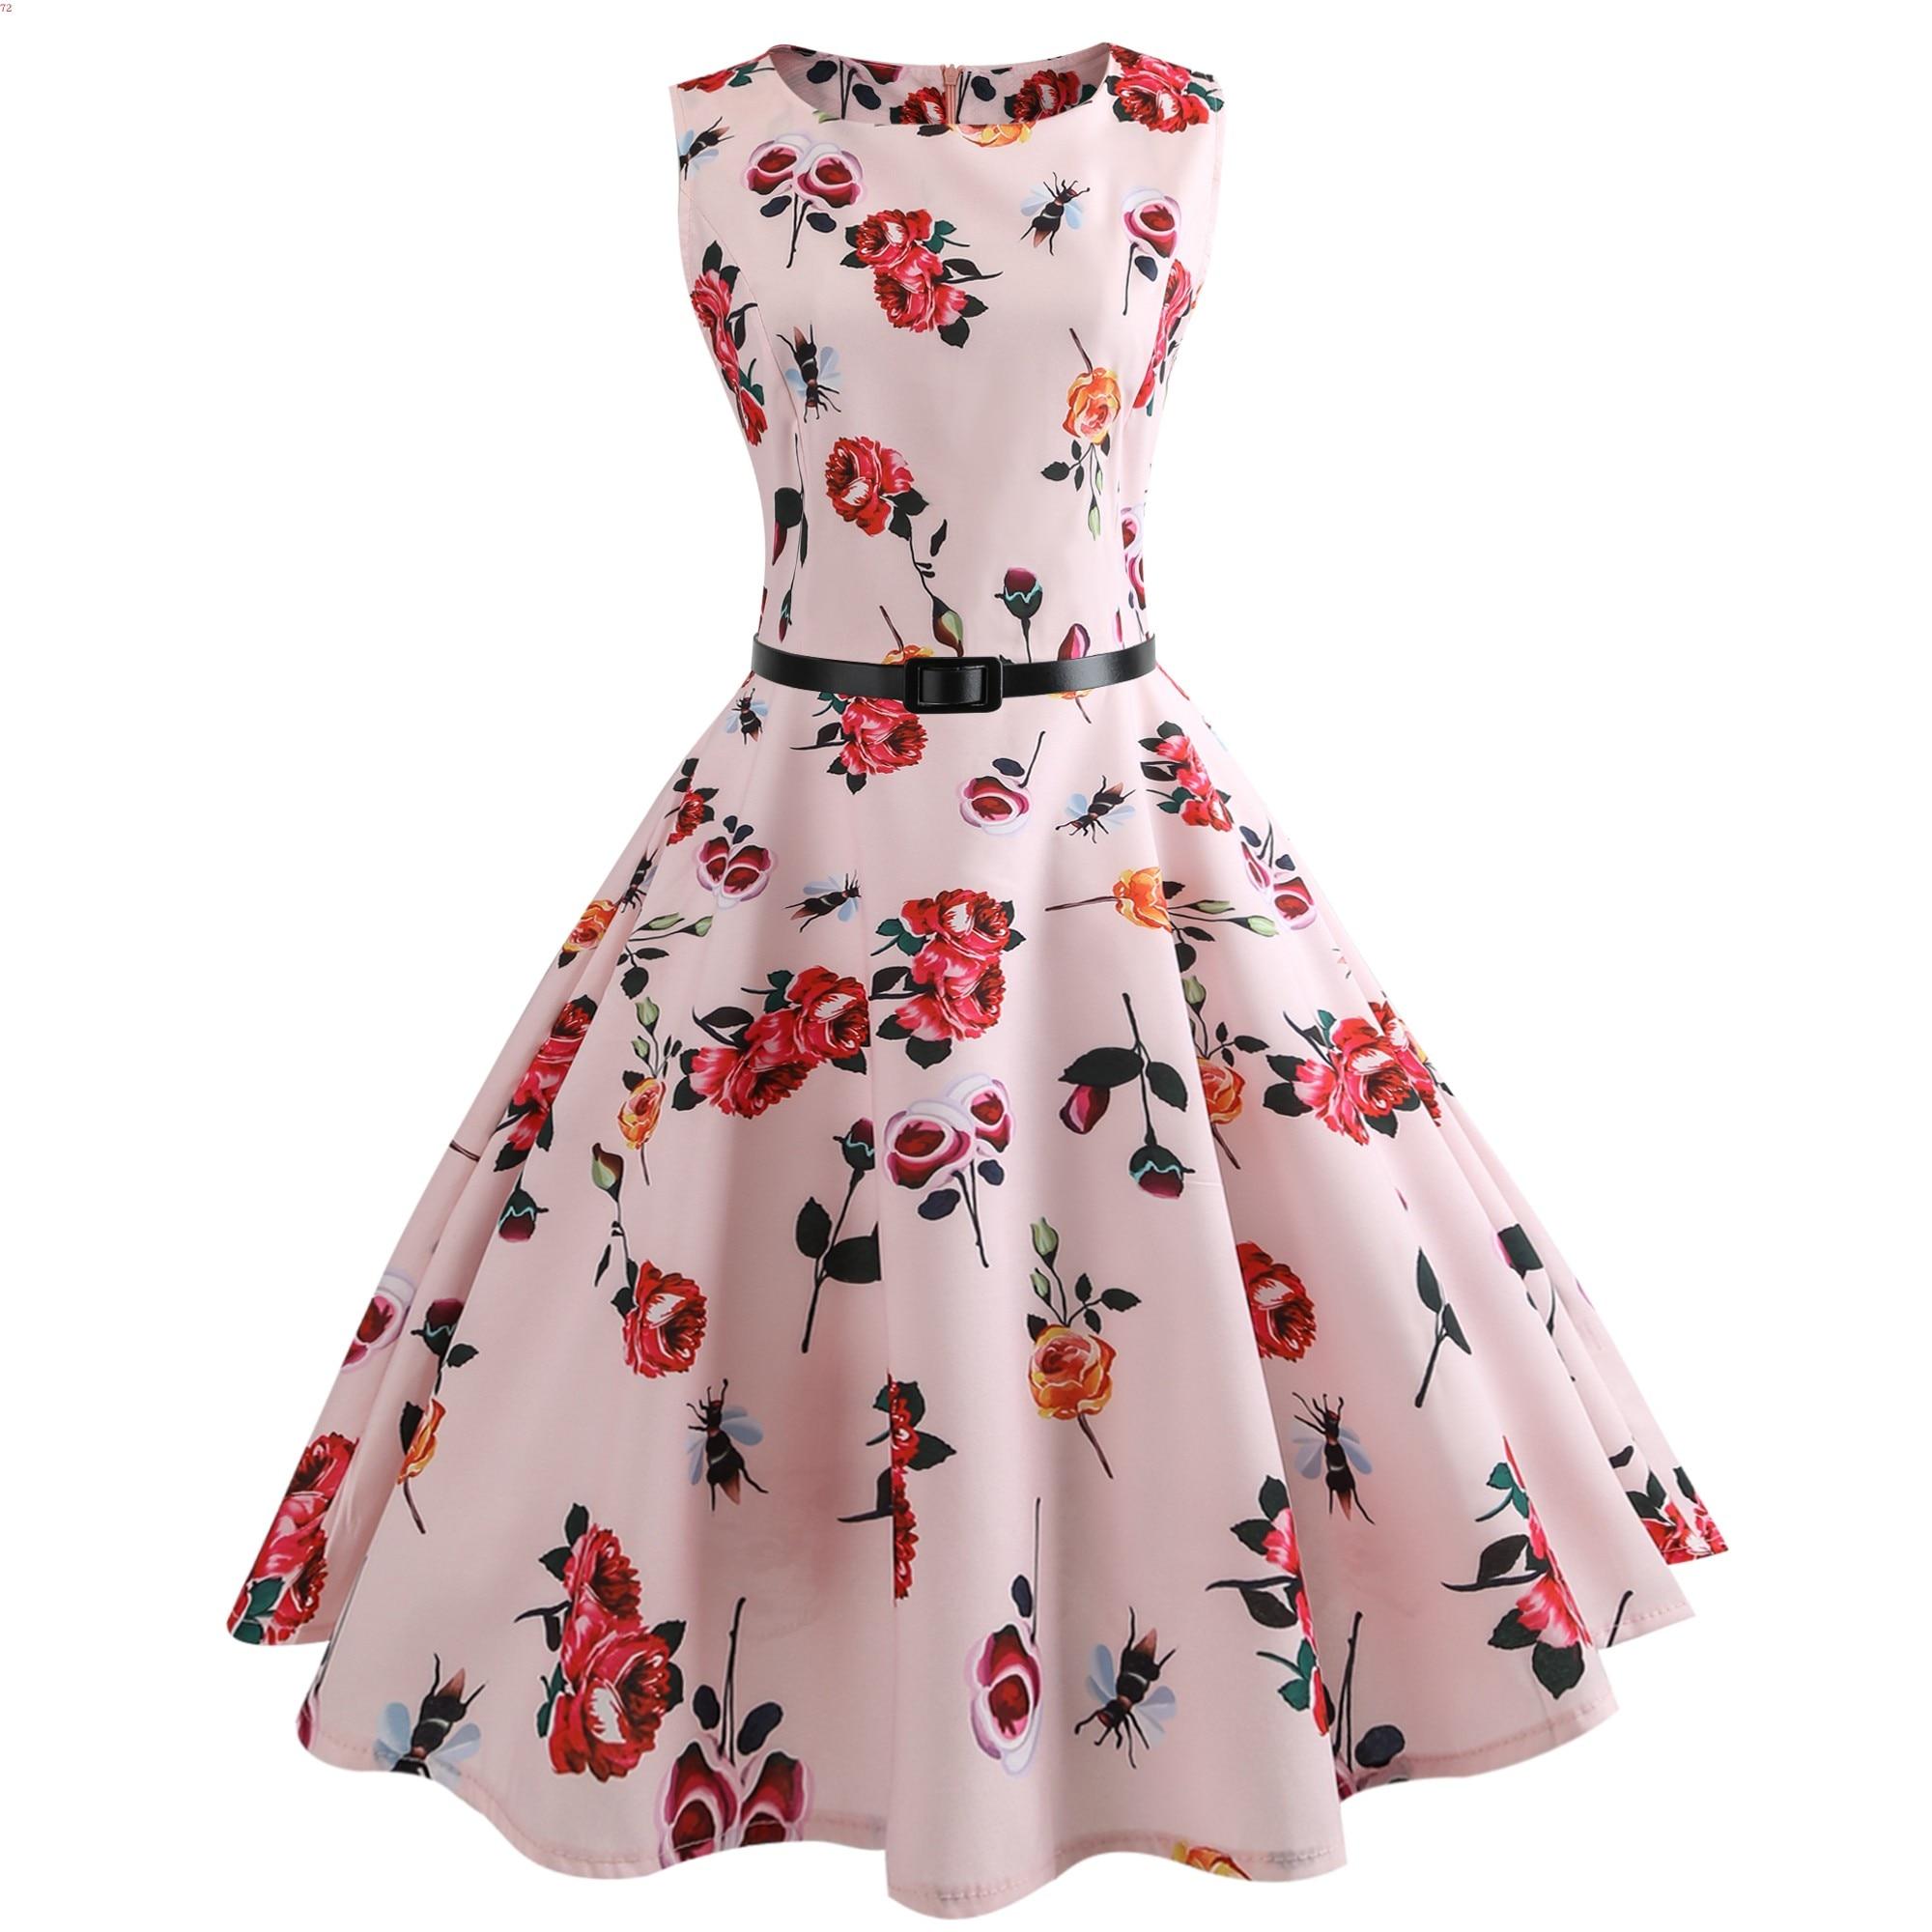 14a4e02b39 Rainbow Plaid Plus Size Women Vintage Dress Robe Vestidos Hepburn 50s Party  Dresses Casual Elegant Rockabilly Pin Up Sundress-in Dresses from Women's  ...